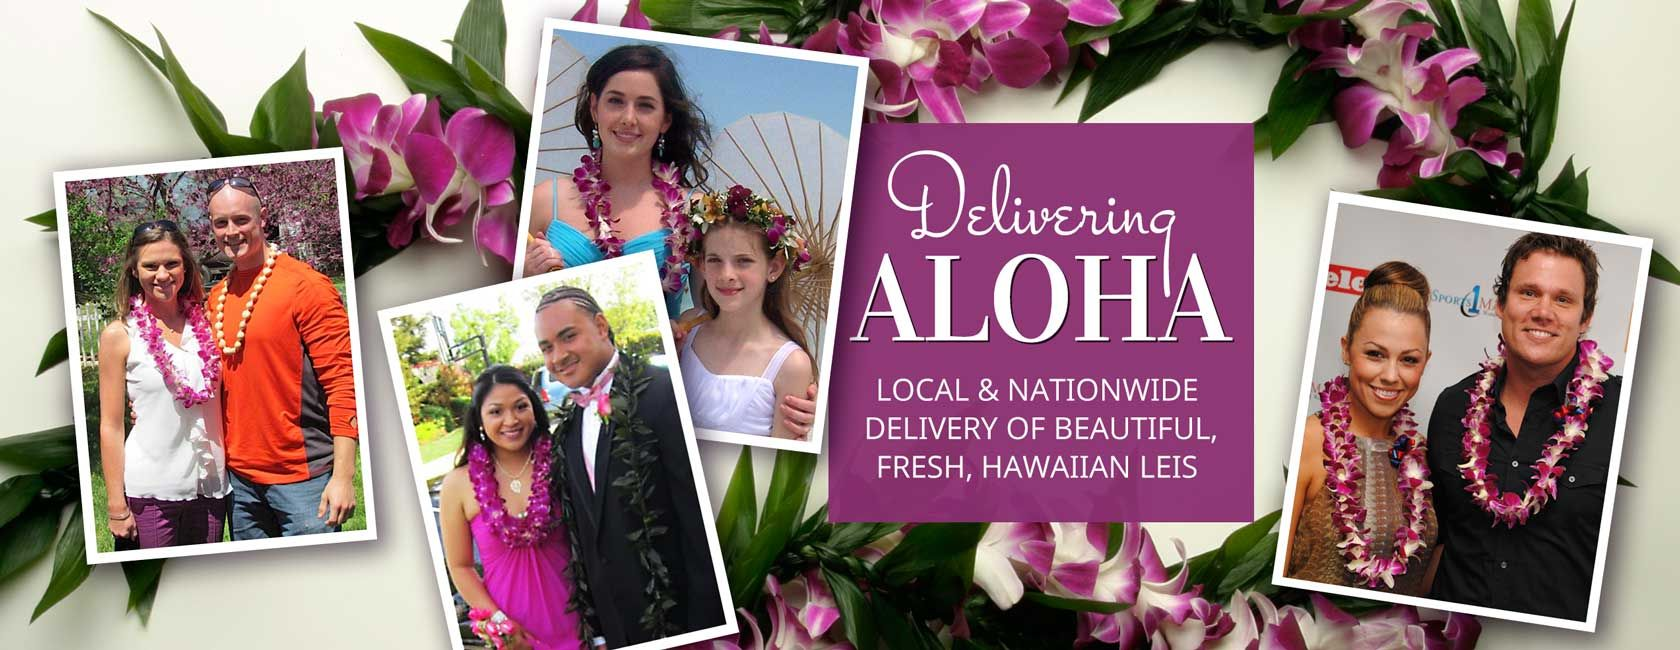 Hawaiian flower leis flowers pinterest leis hawaiian leis and hawaiian flower leis izmirmasajfo